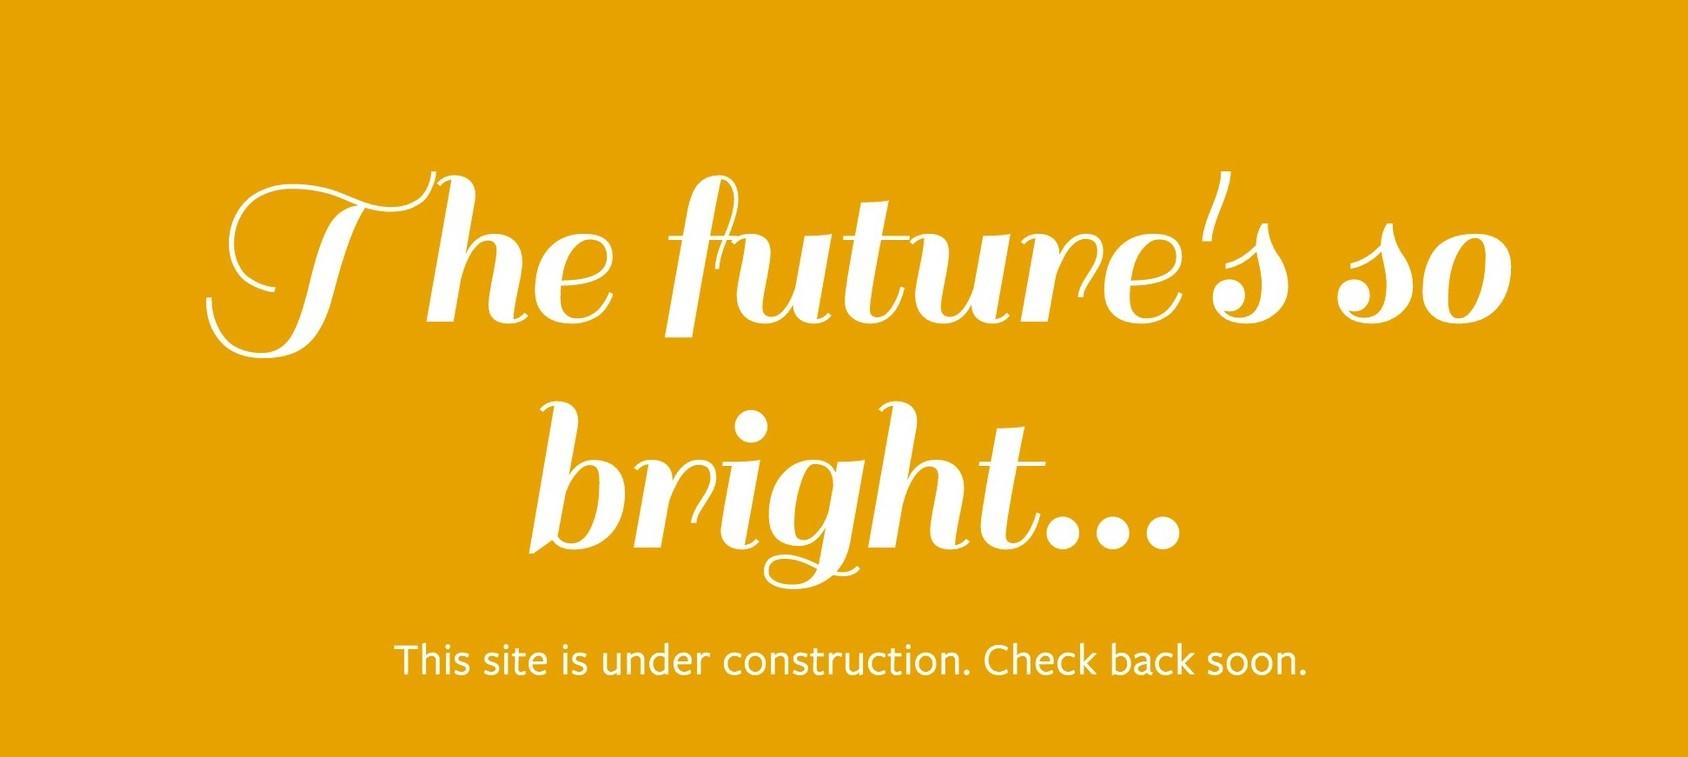 Site Under Construction